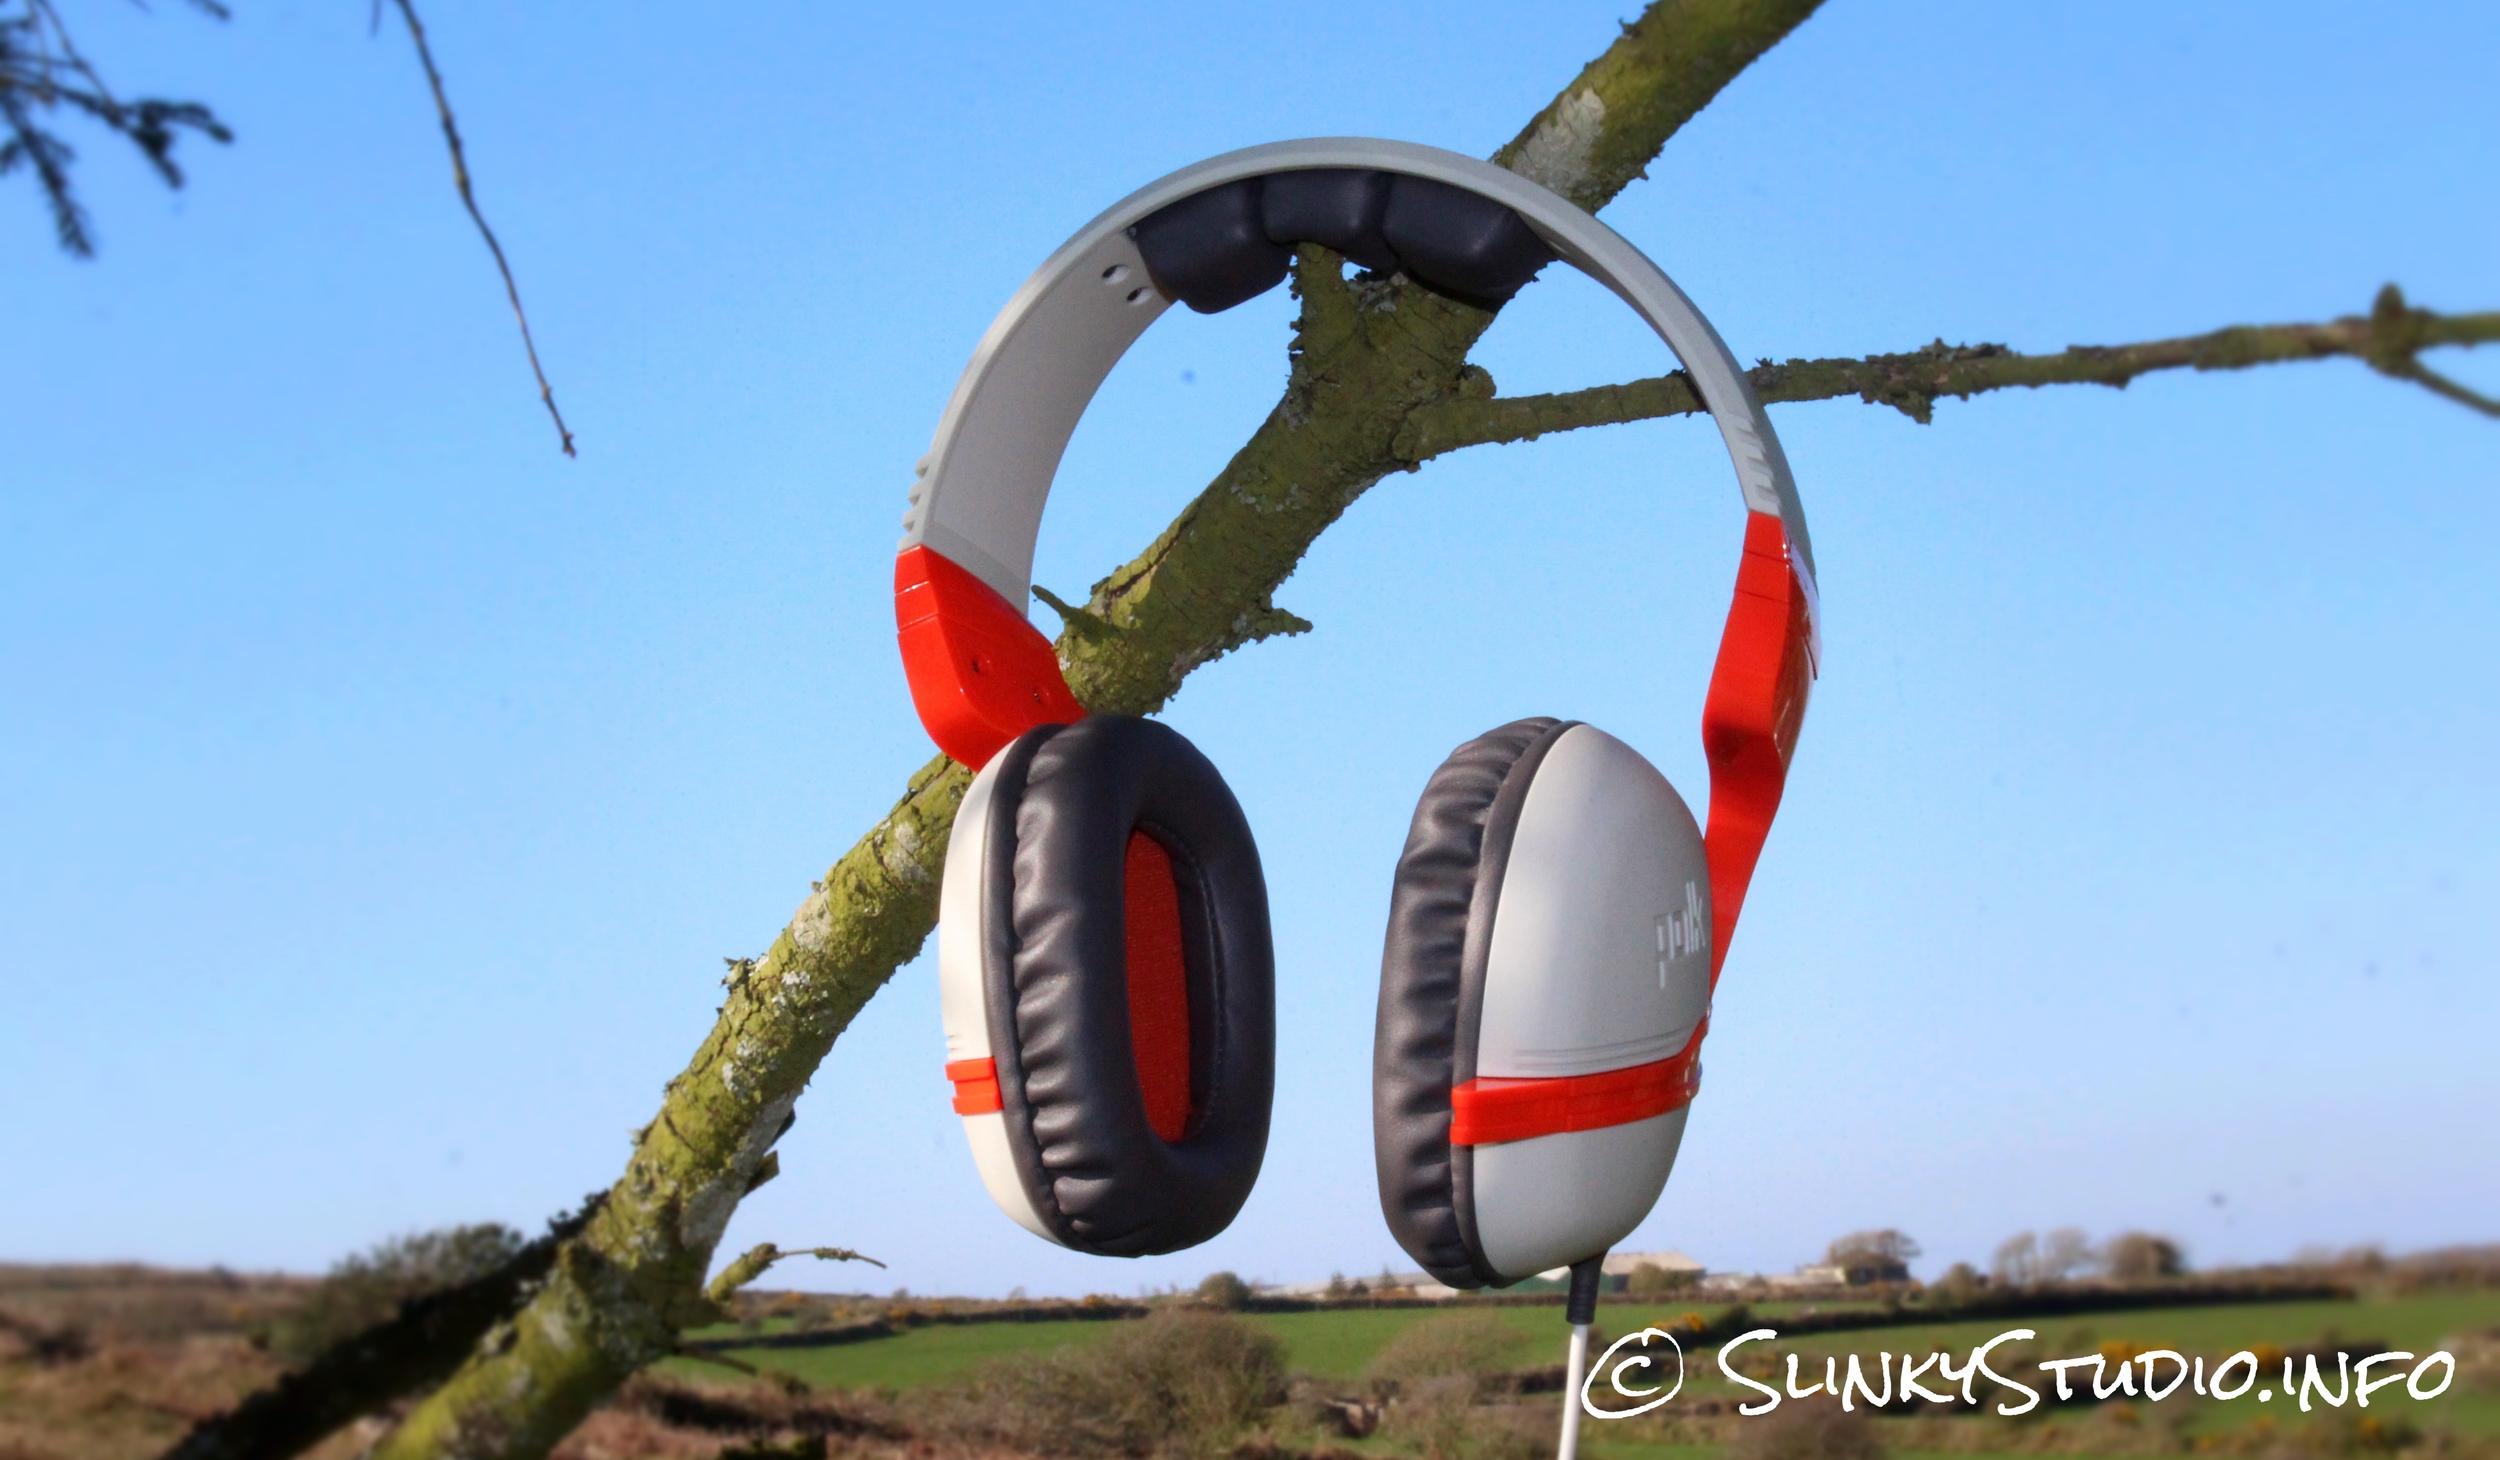 Polk Audio Striker ZX Gaming Headset Sky Shot